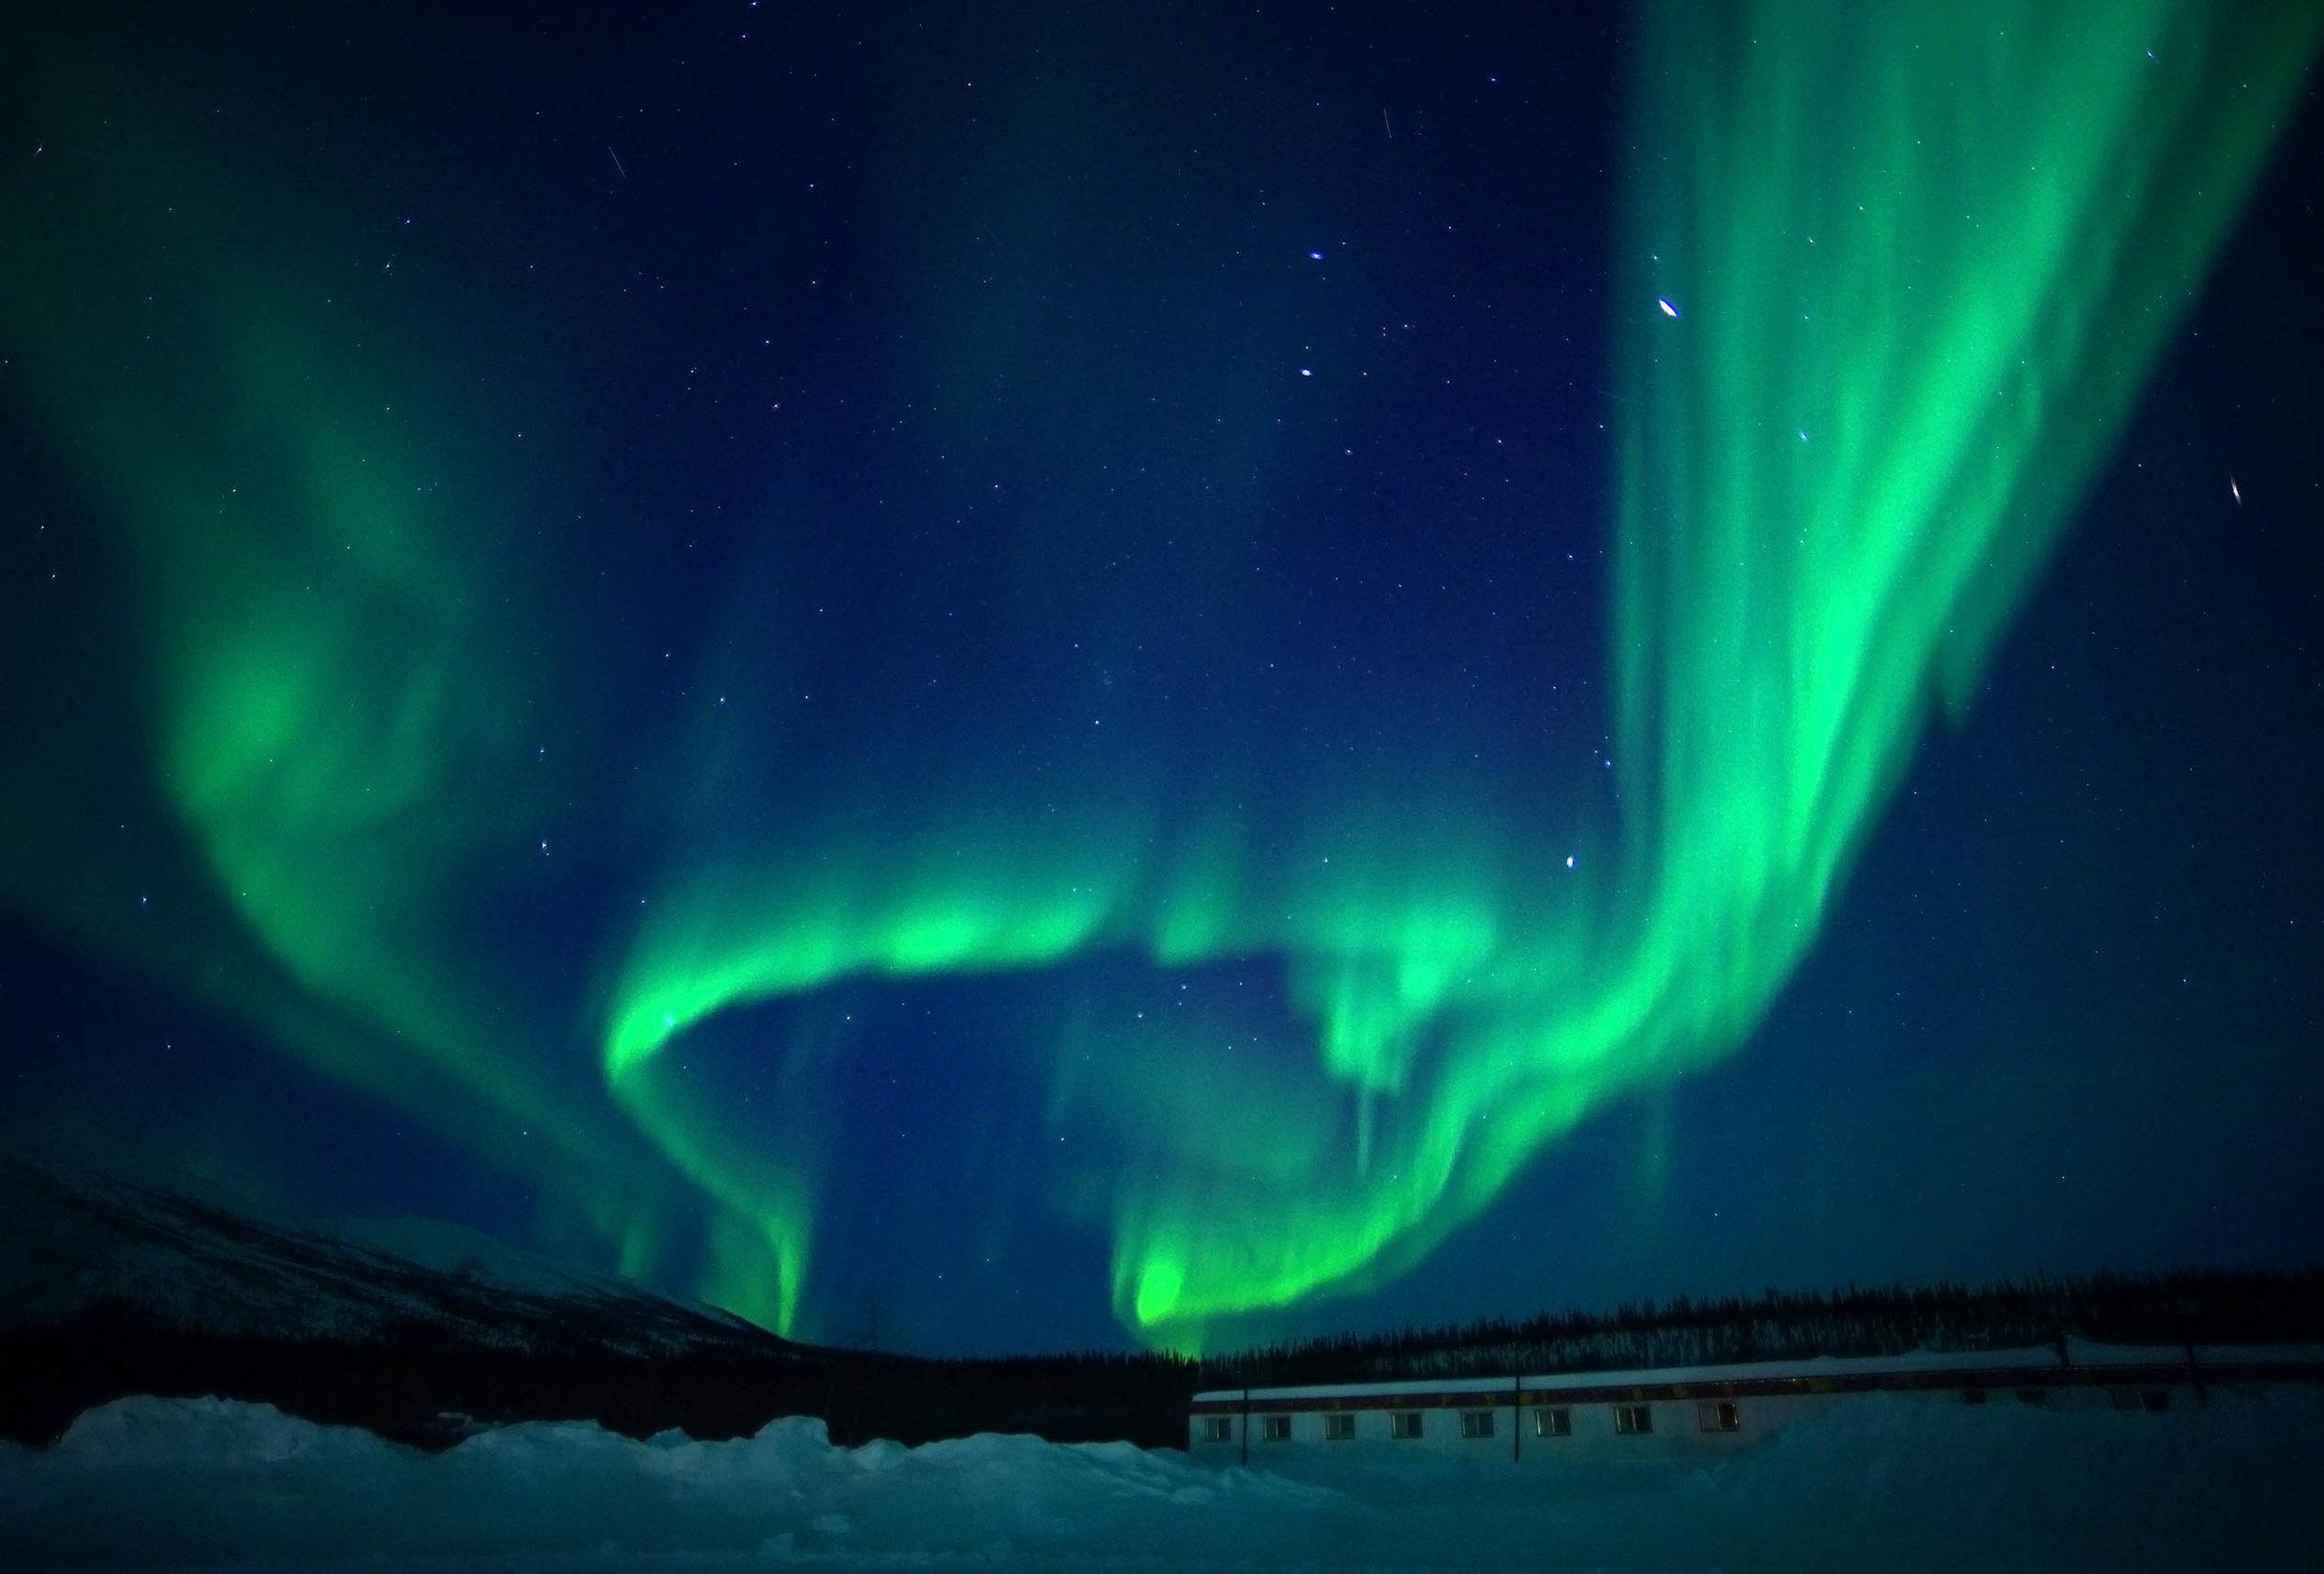 Photo of the aurora borealis over the South Inn by Kenji Sato.